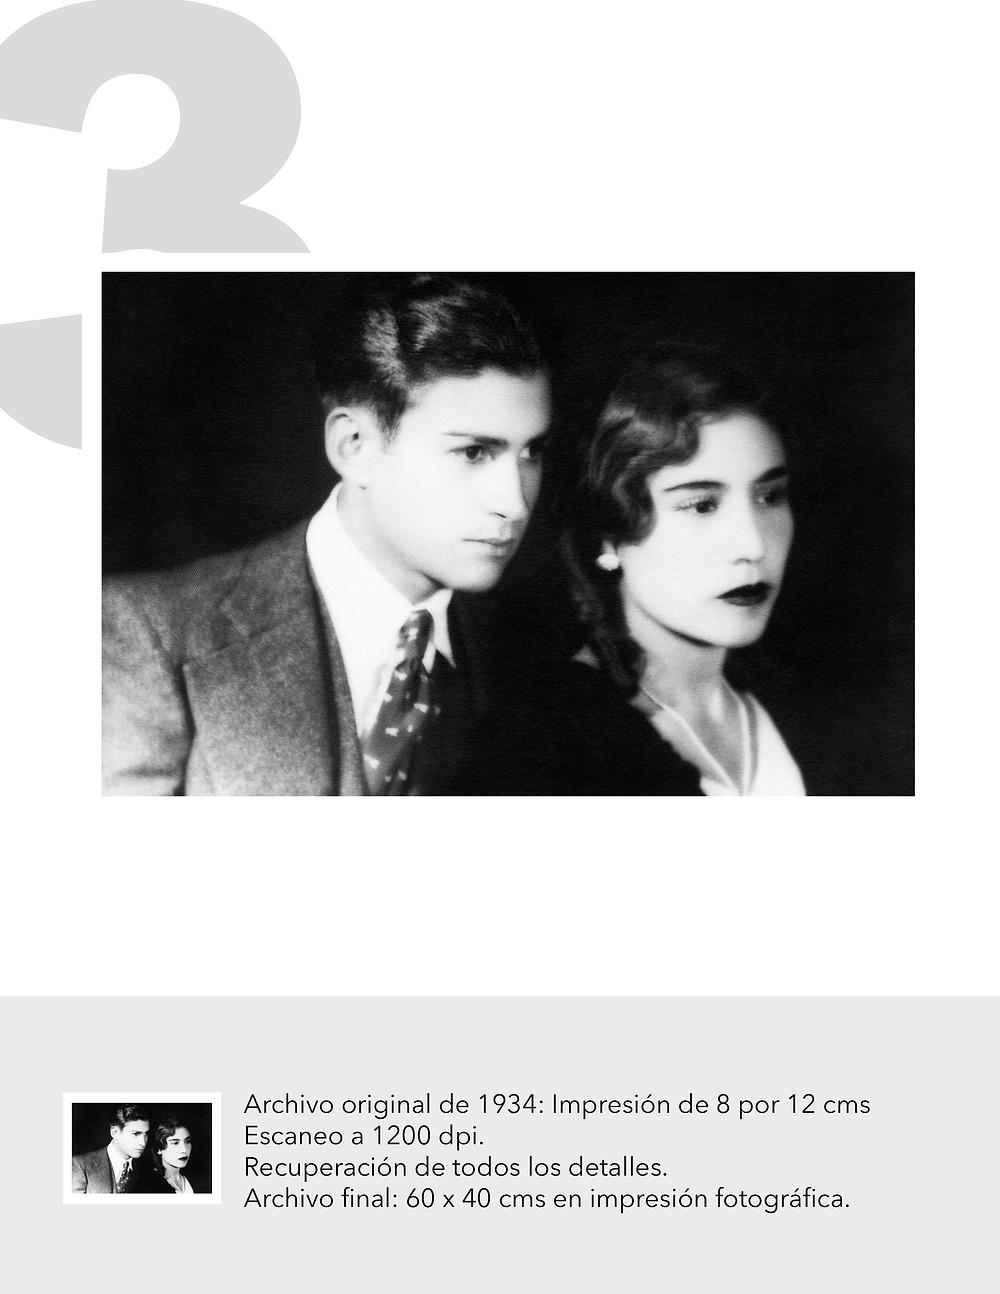 Foto antigüa escaneada en alta resolución de pareja de esposos en 1930